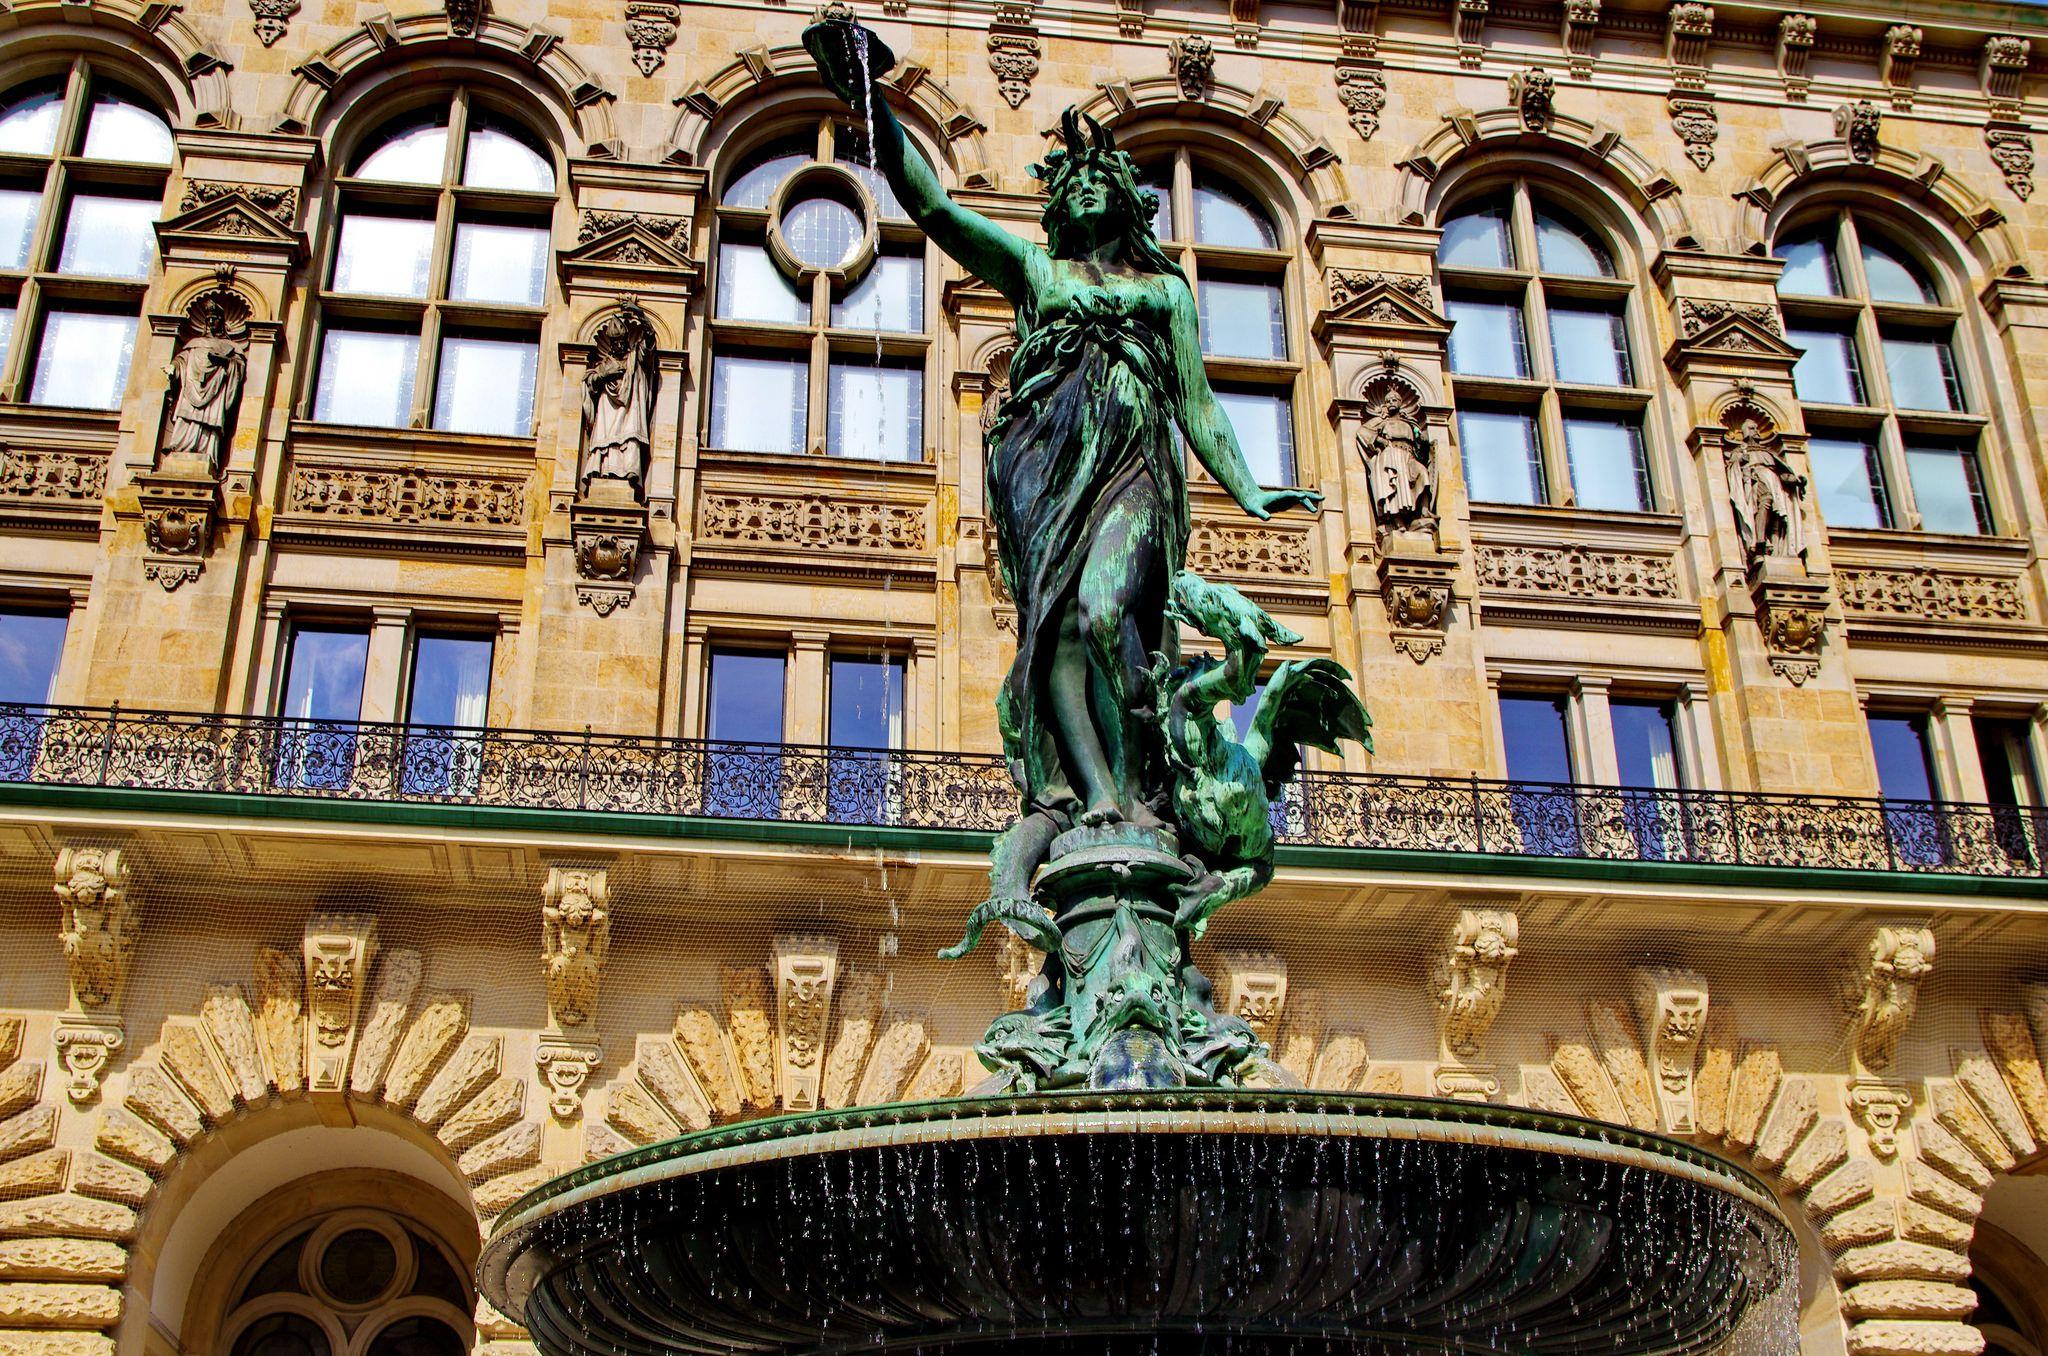 https://flic.kr/p/u3a4AY | Hambourg en Mai - 67 Rathaus - Hôtel de Ville